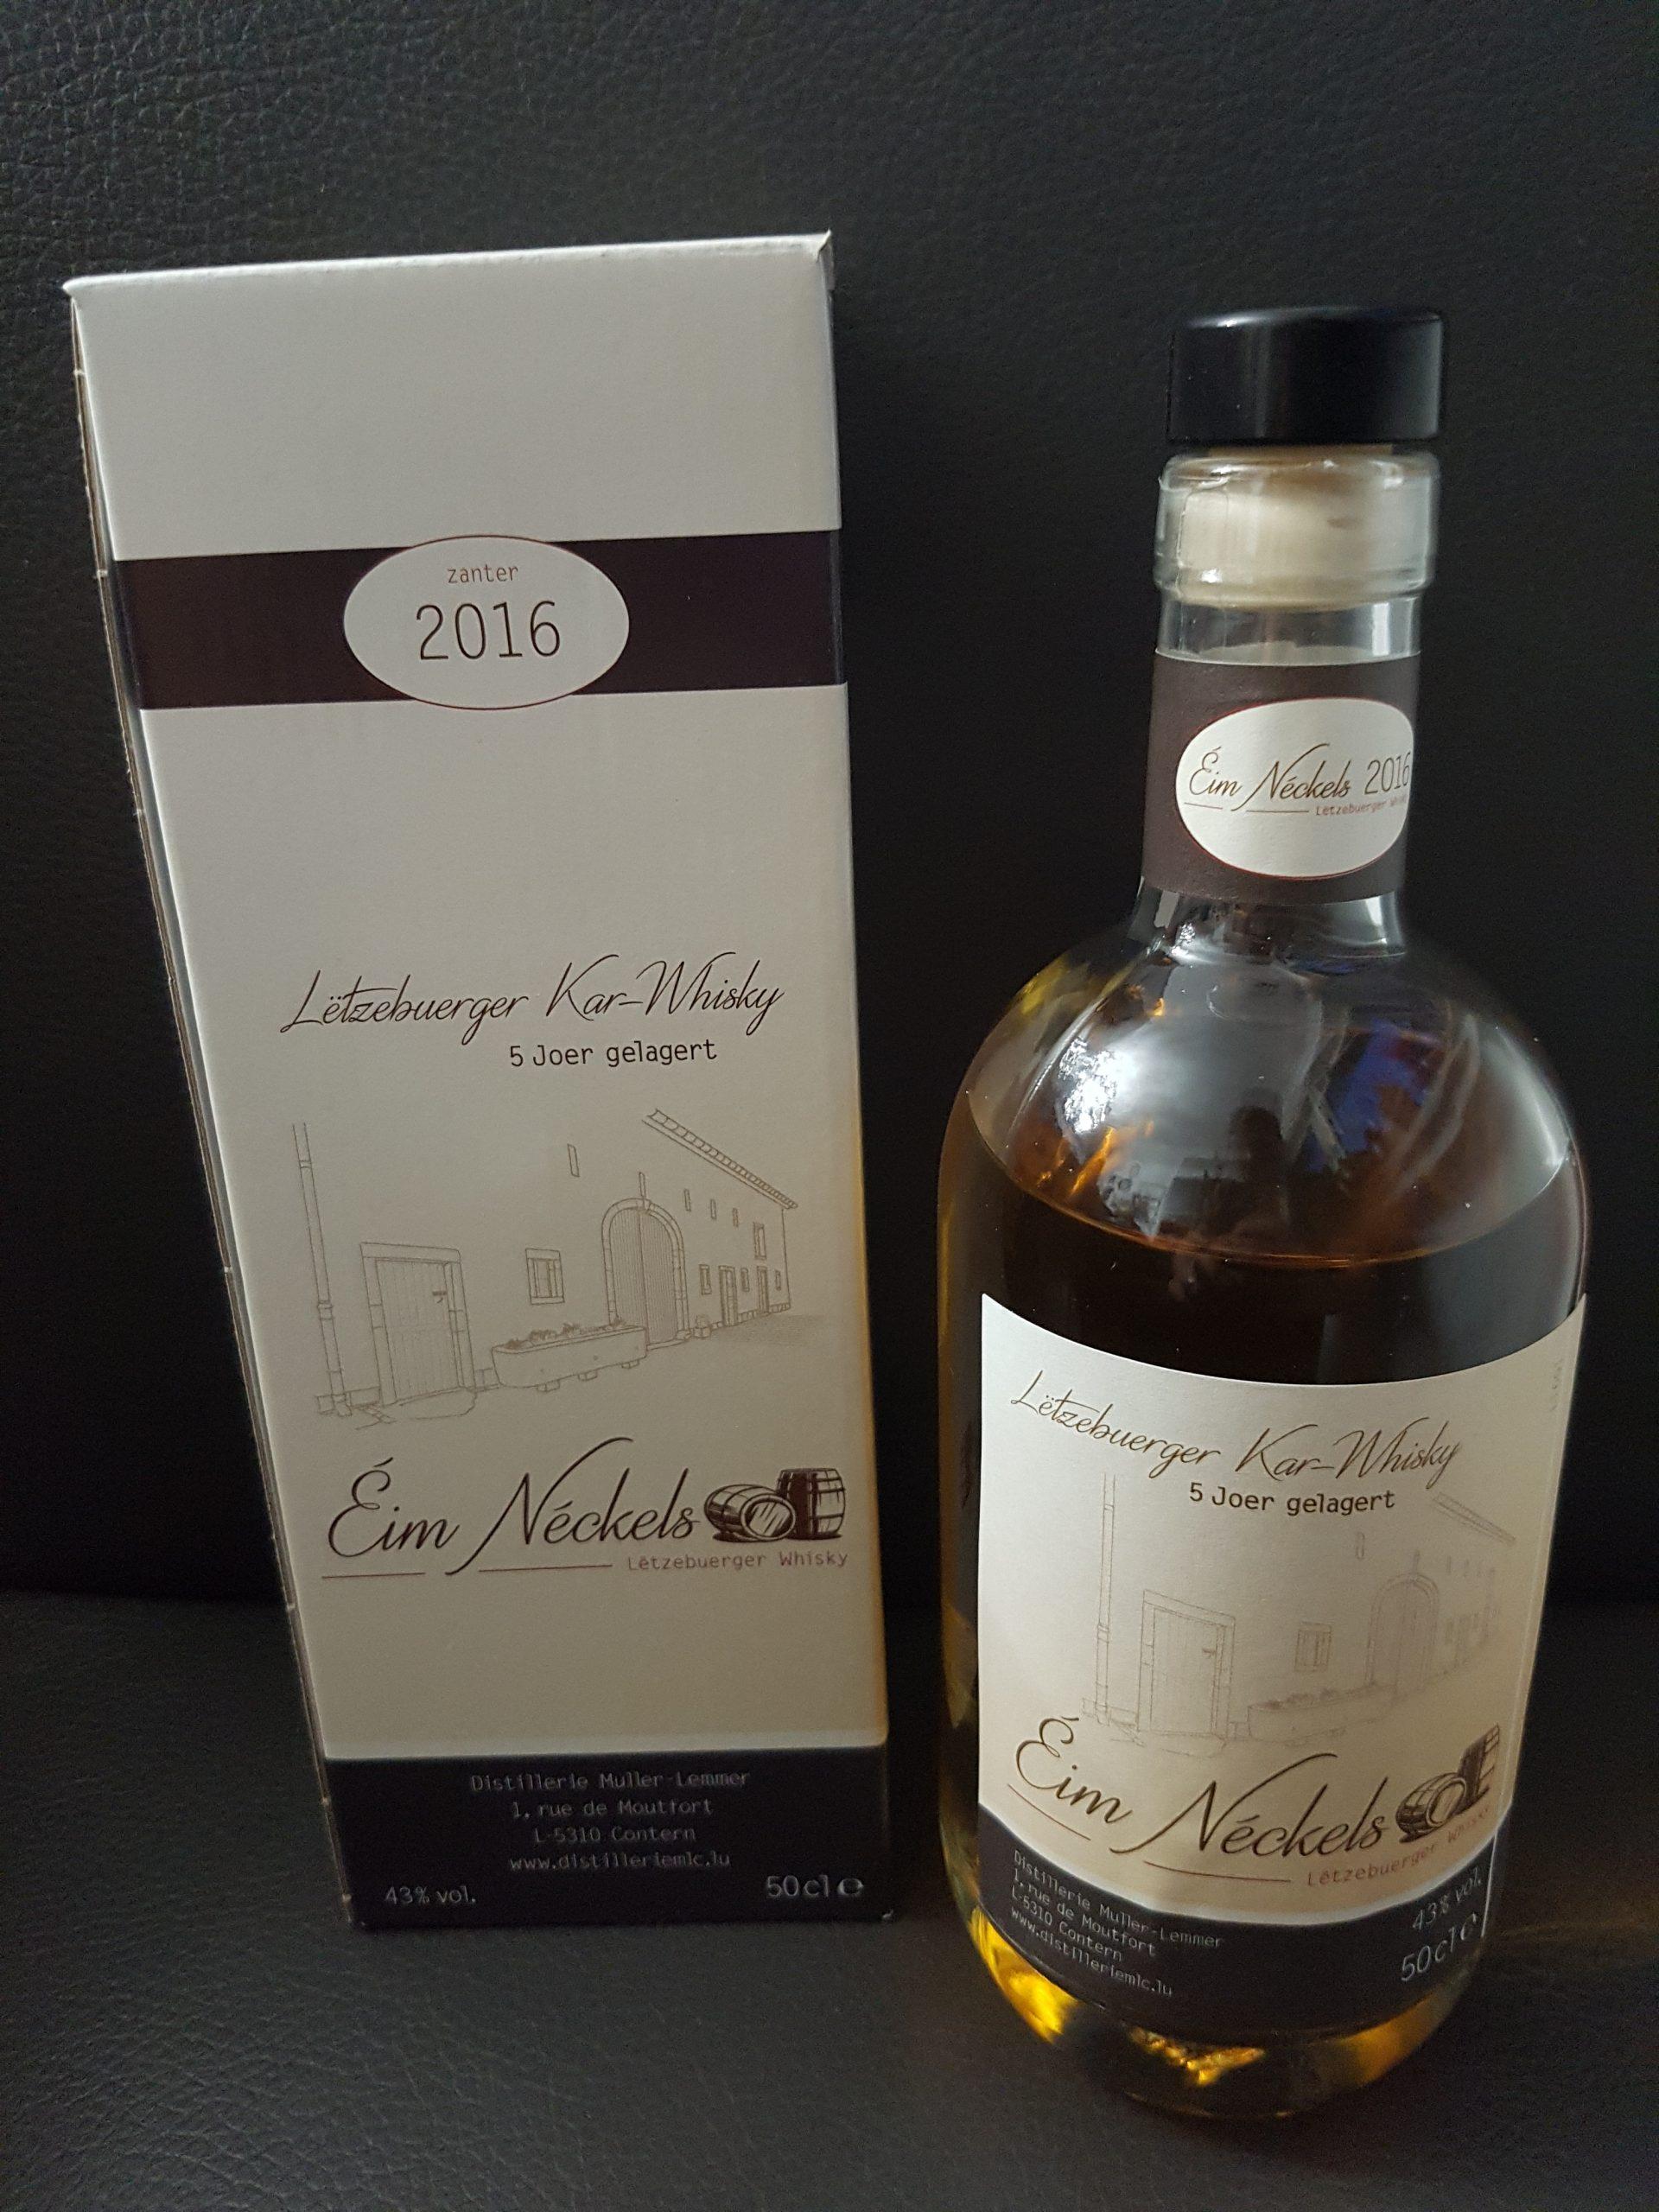 Eim Neckels Letzebuerger Kar-Whisky